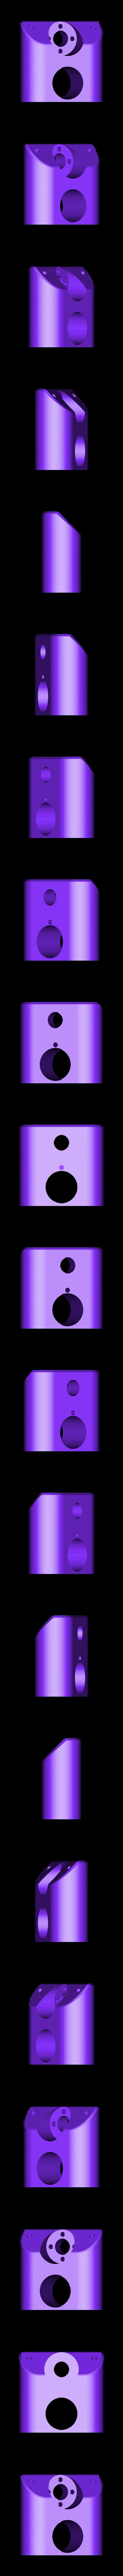 Neutron_-_Cart.stl Download free STL file Neutron - Open Source 3D Printer • 3D printable object, ATOM3dp